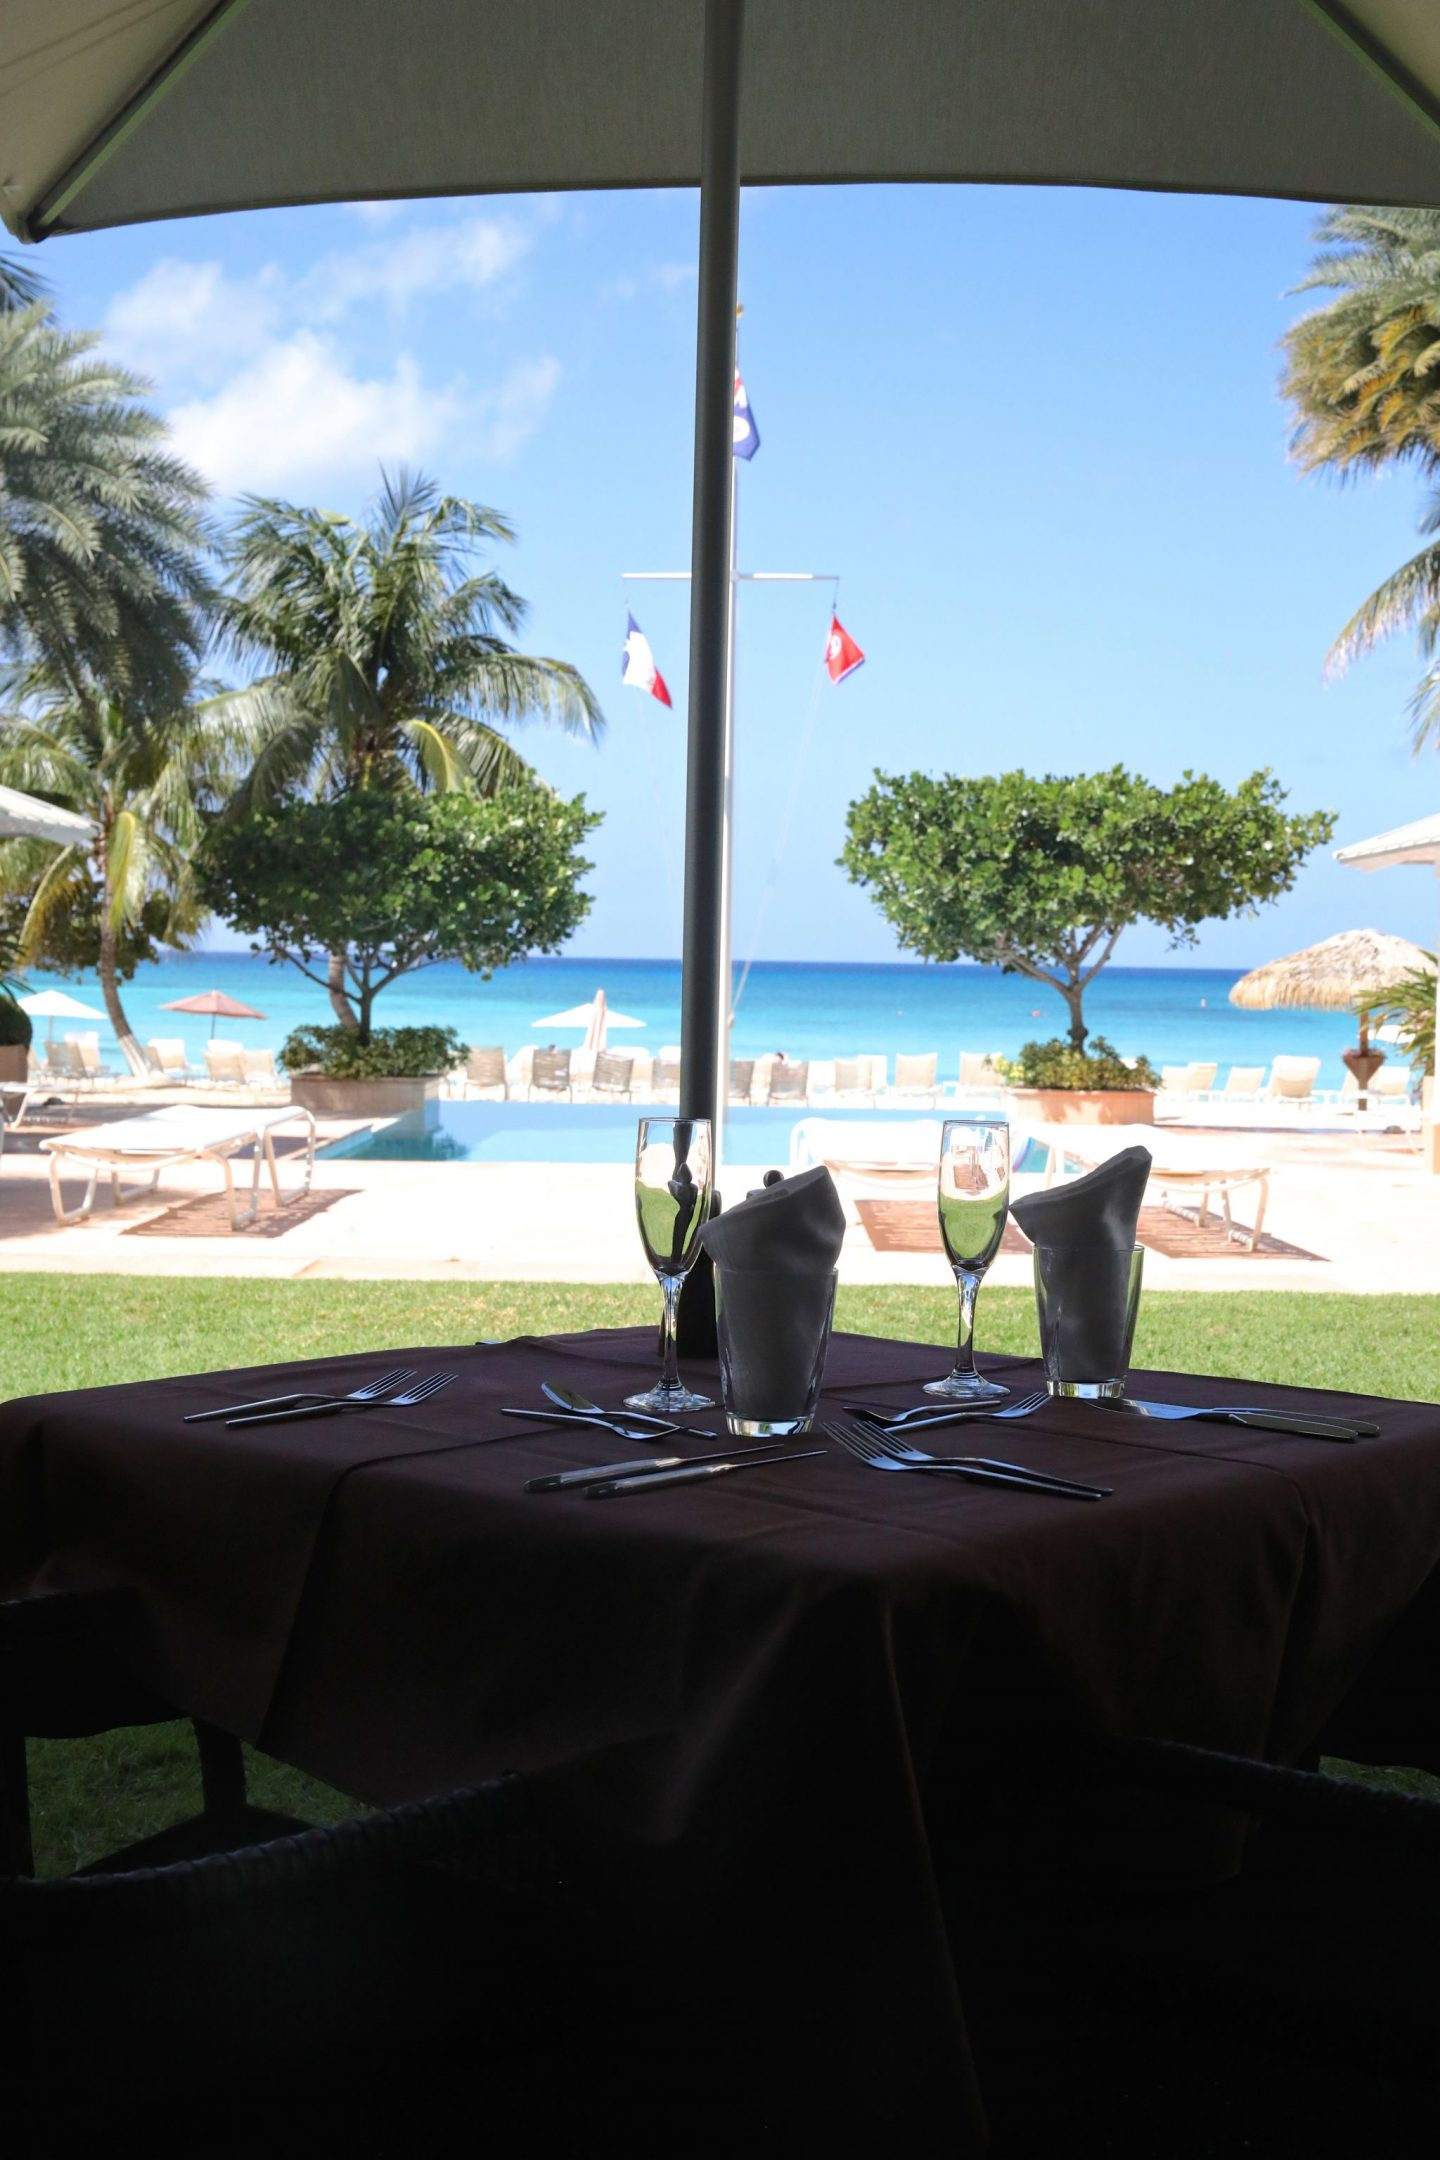 Brunch at Luca, Grand Cayman, The Cayman Islands, Katie Heath, KALANCHOE